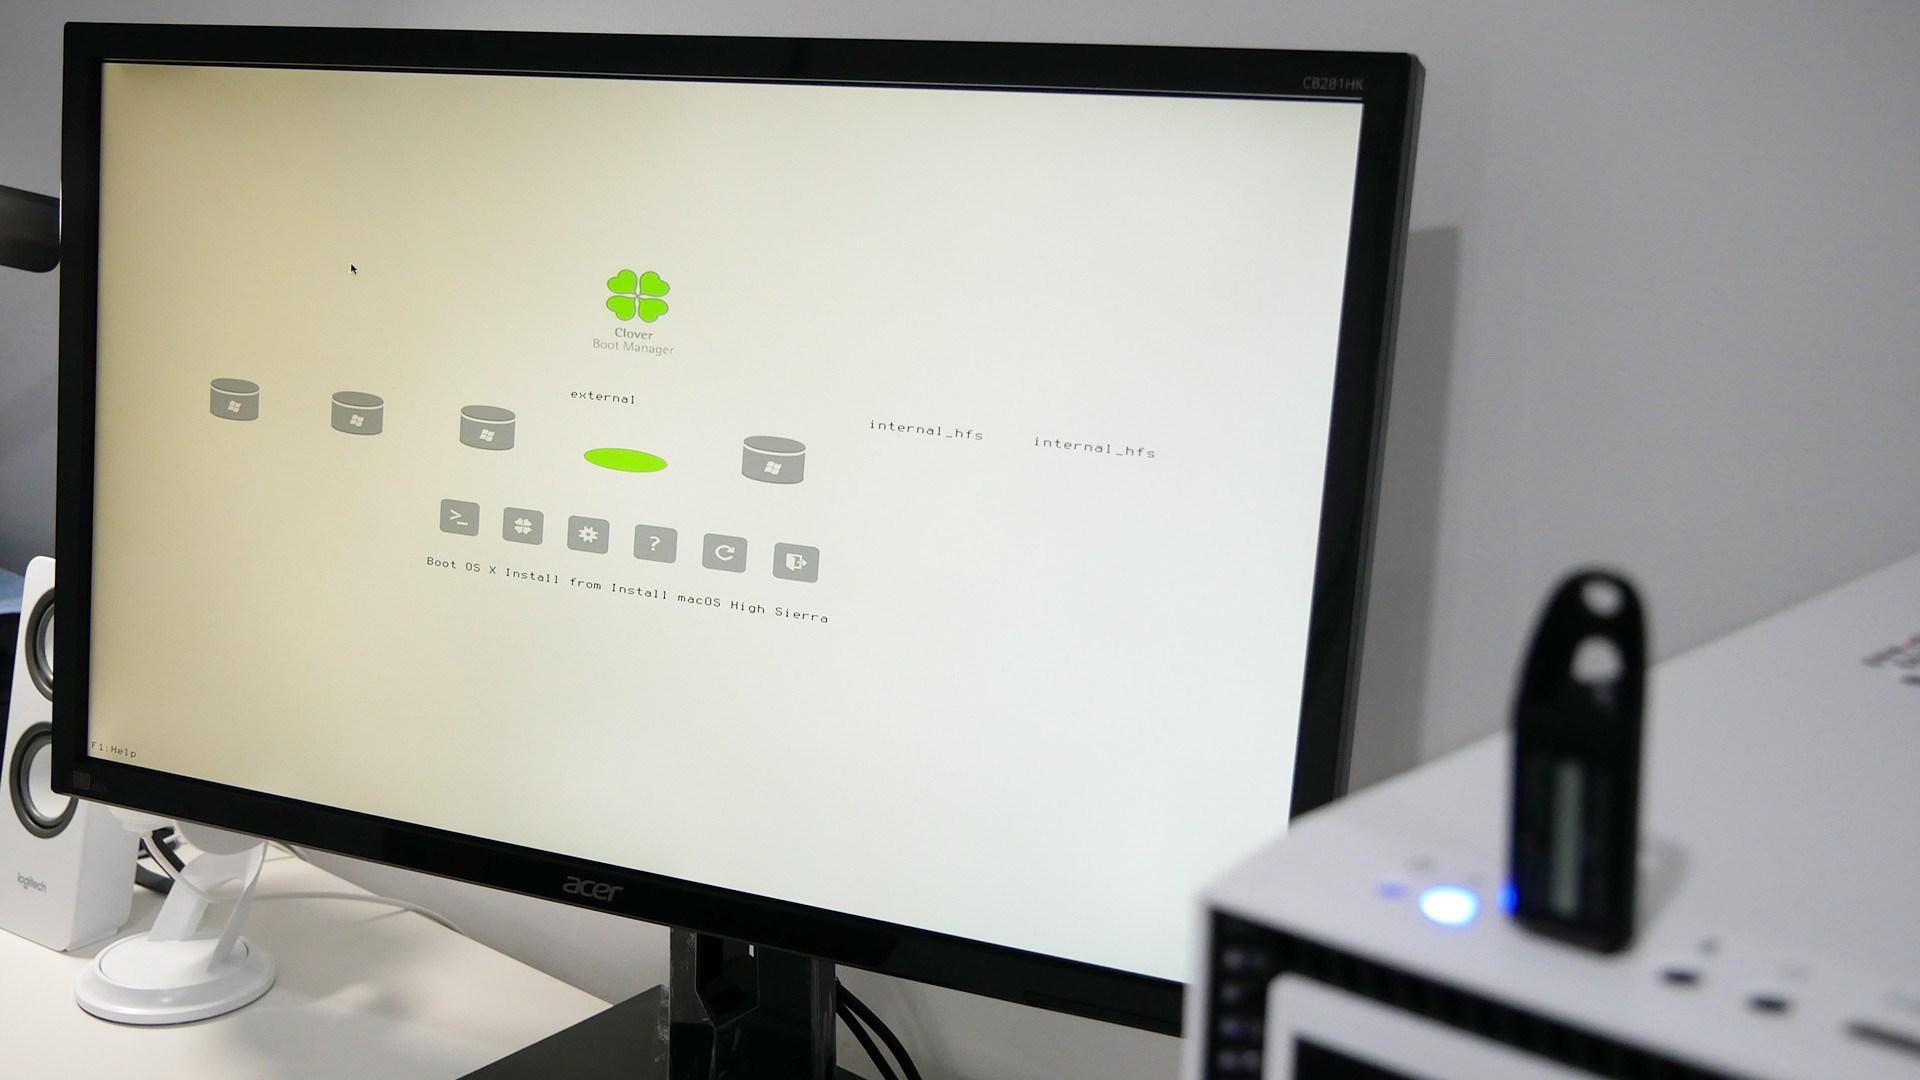 cr u00e9er une clef usb avec macos high sierra sur windows 10 avec transmac